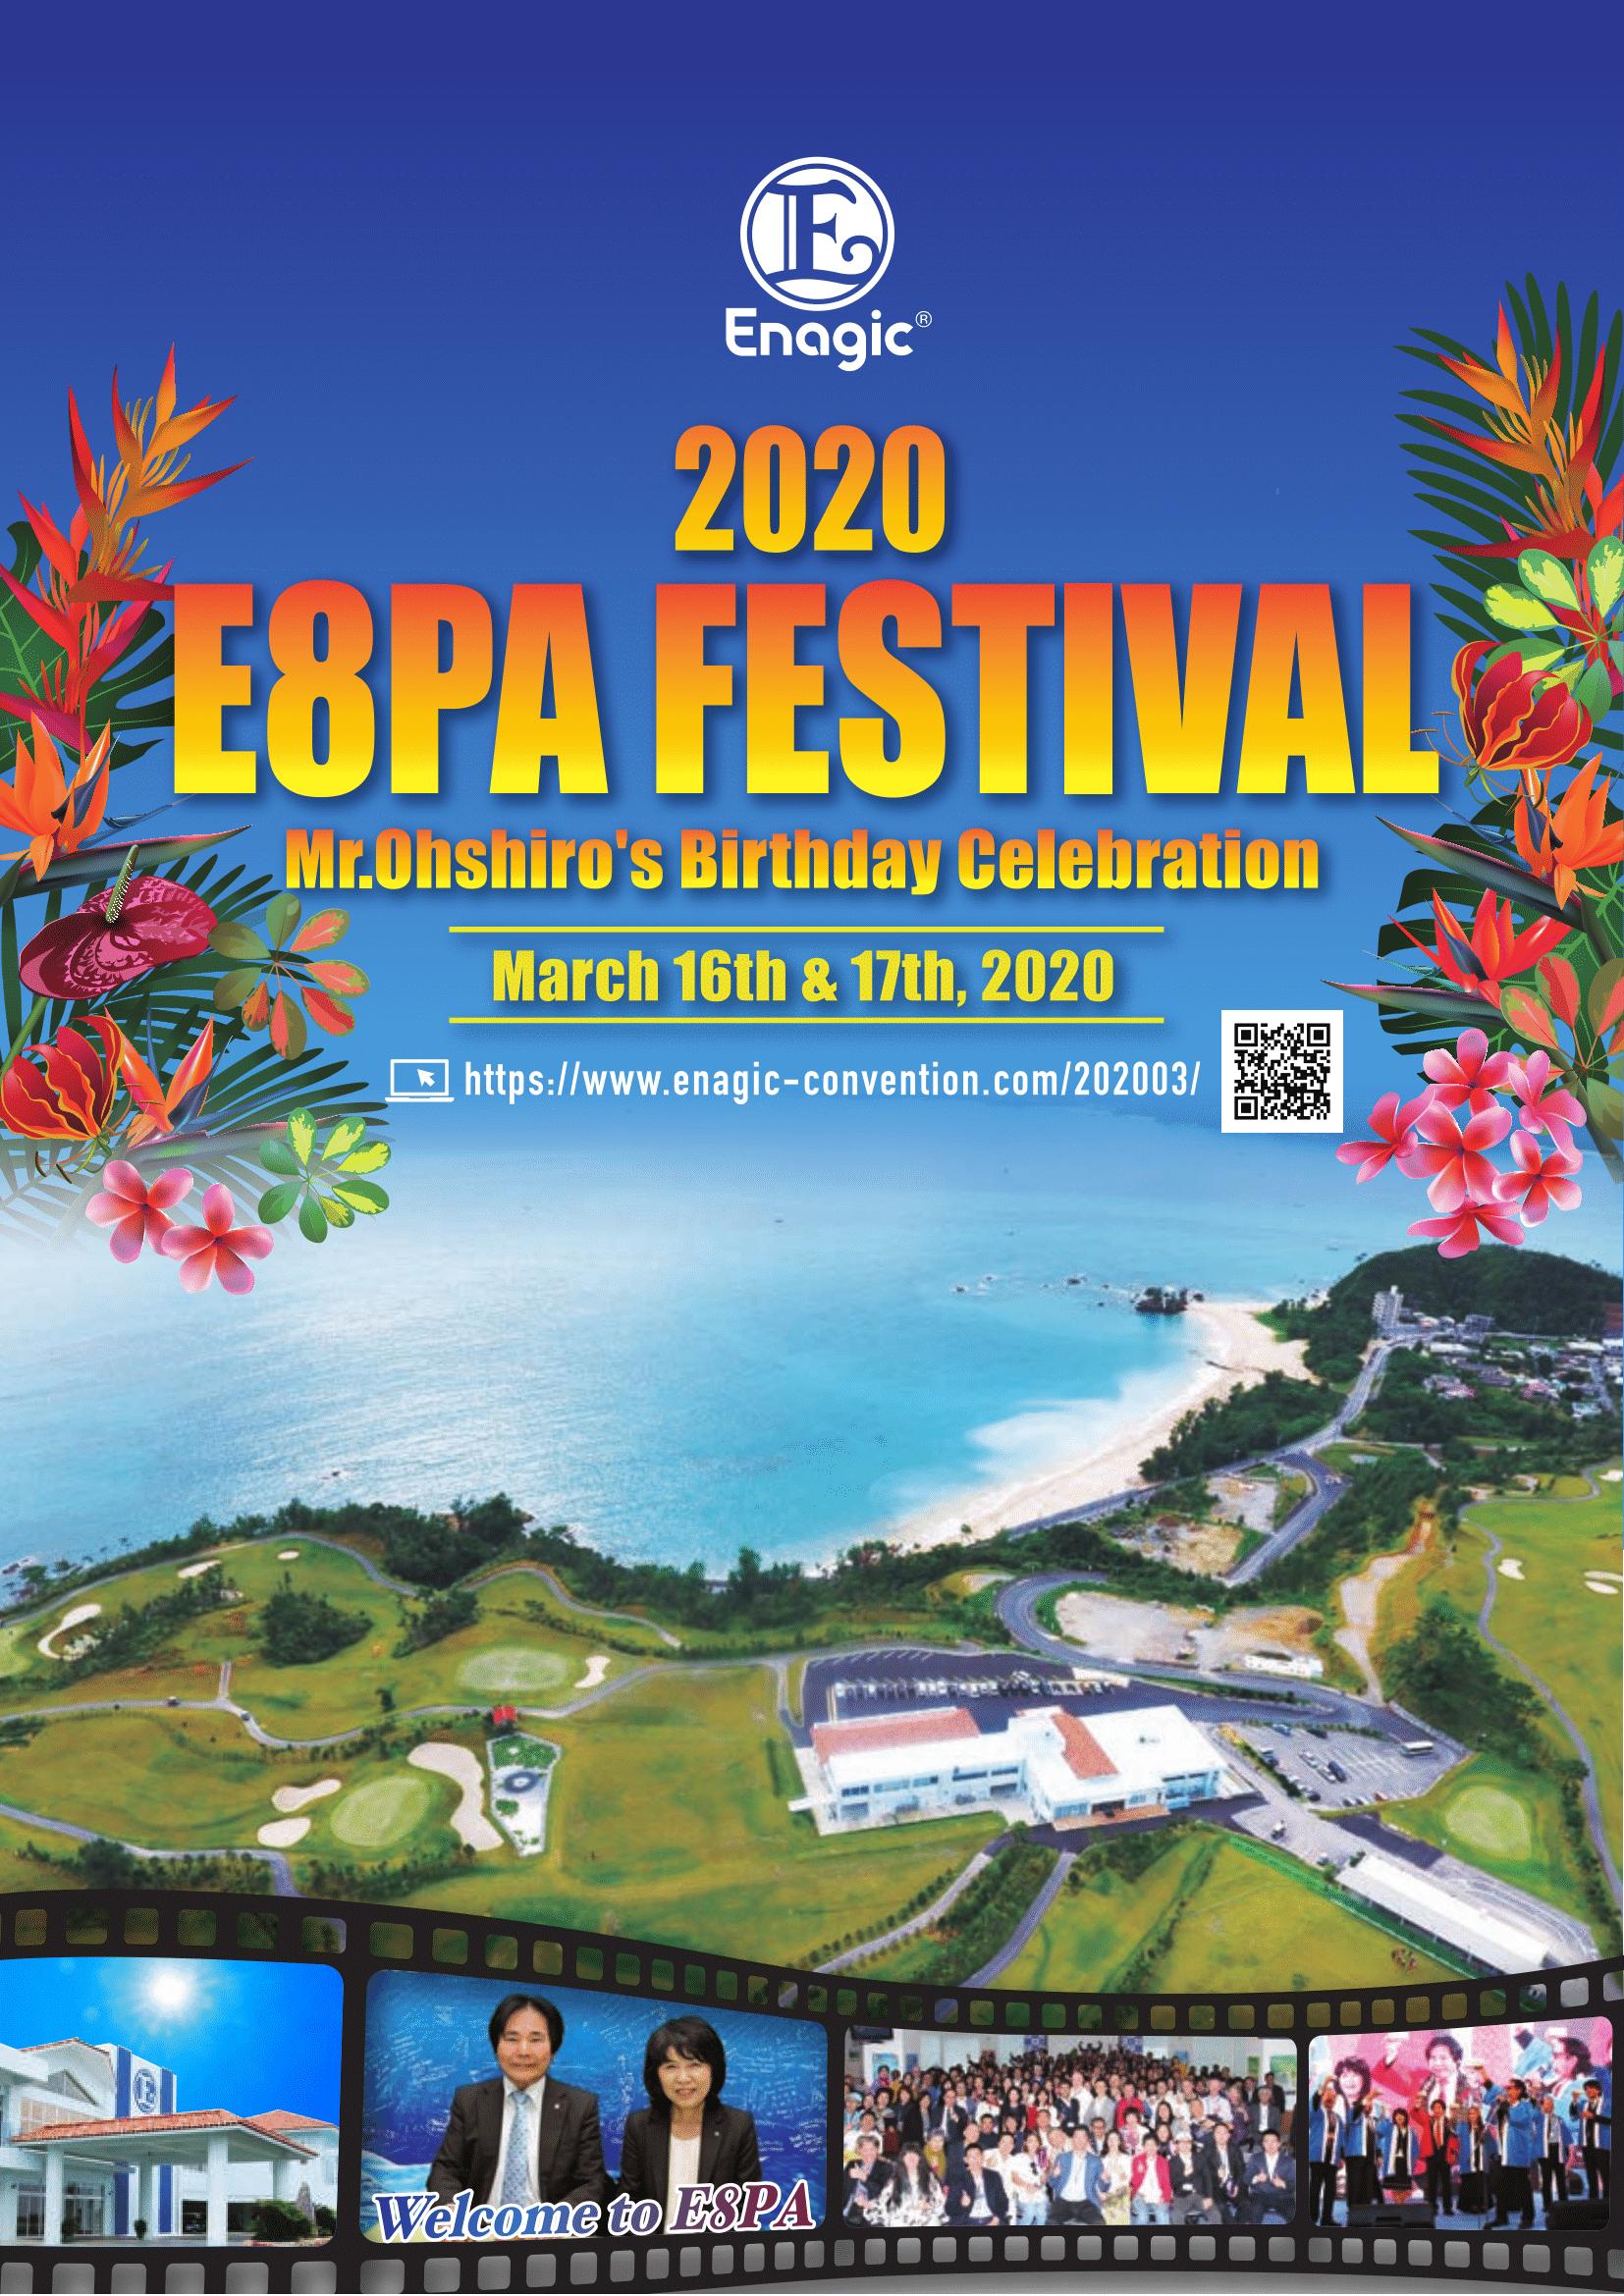 2020 E8PA Festival